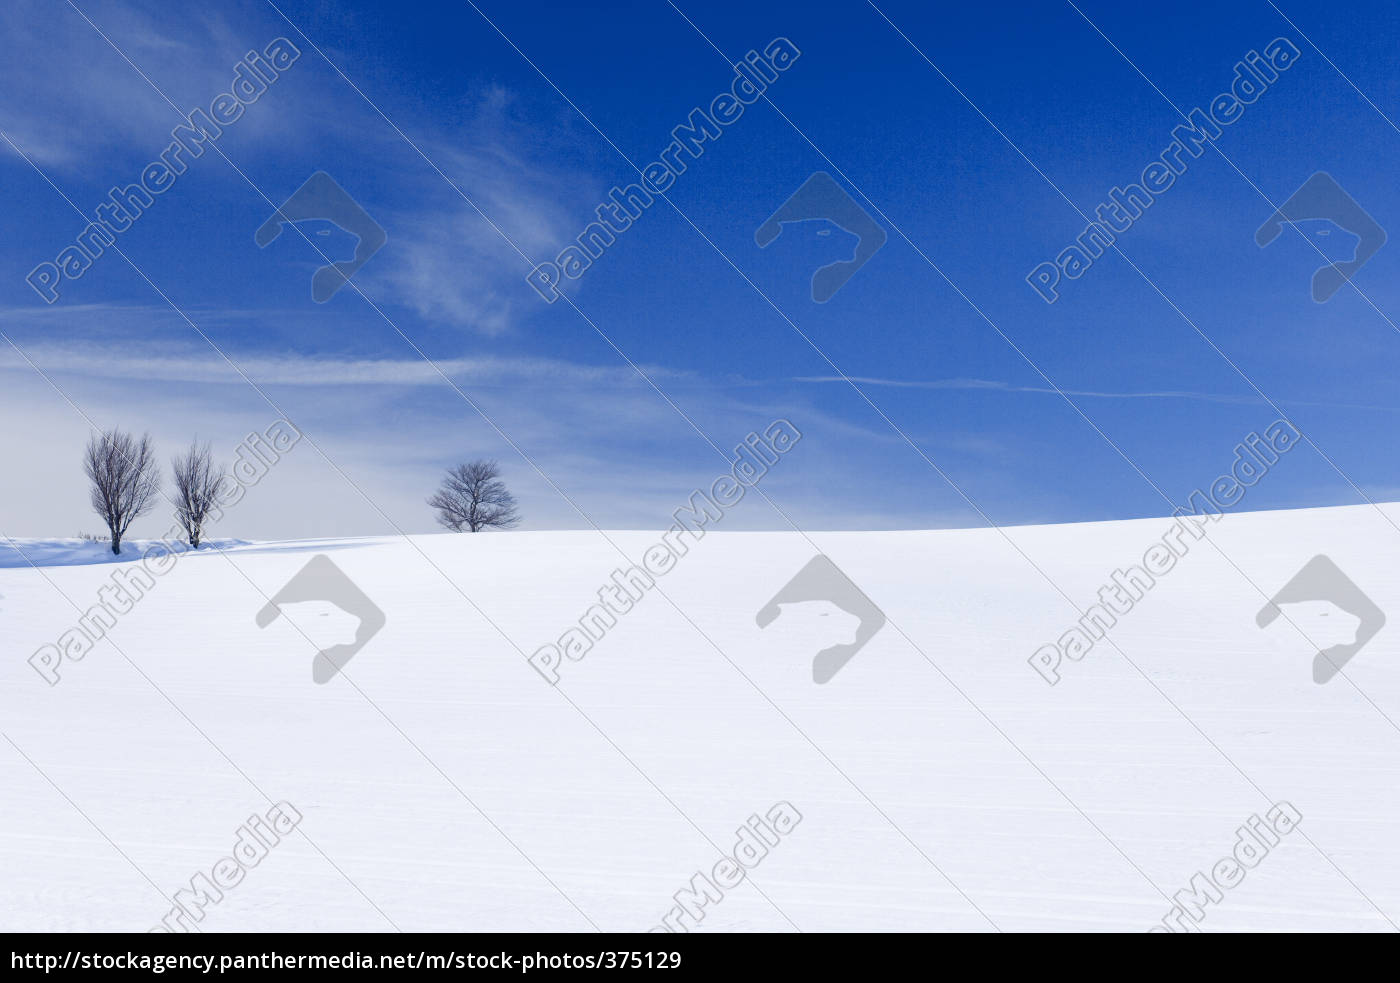 snowlandscape - 375129